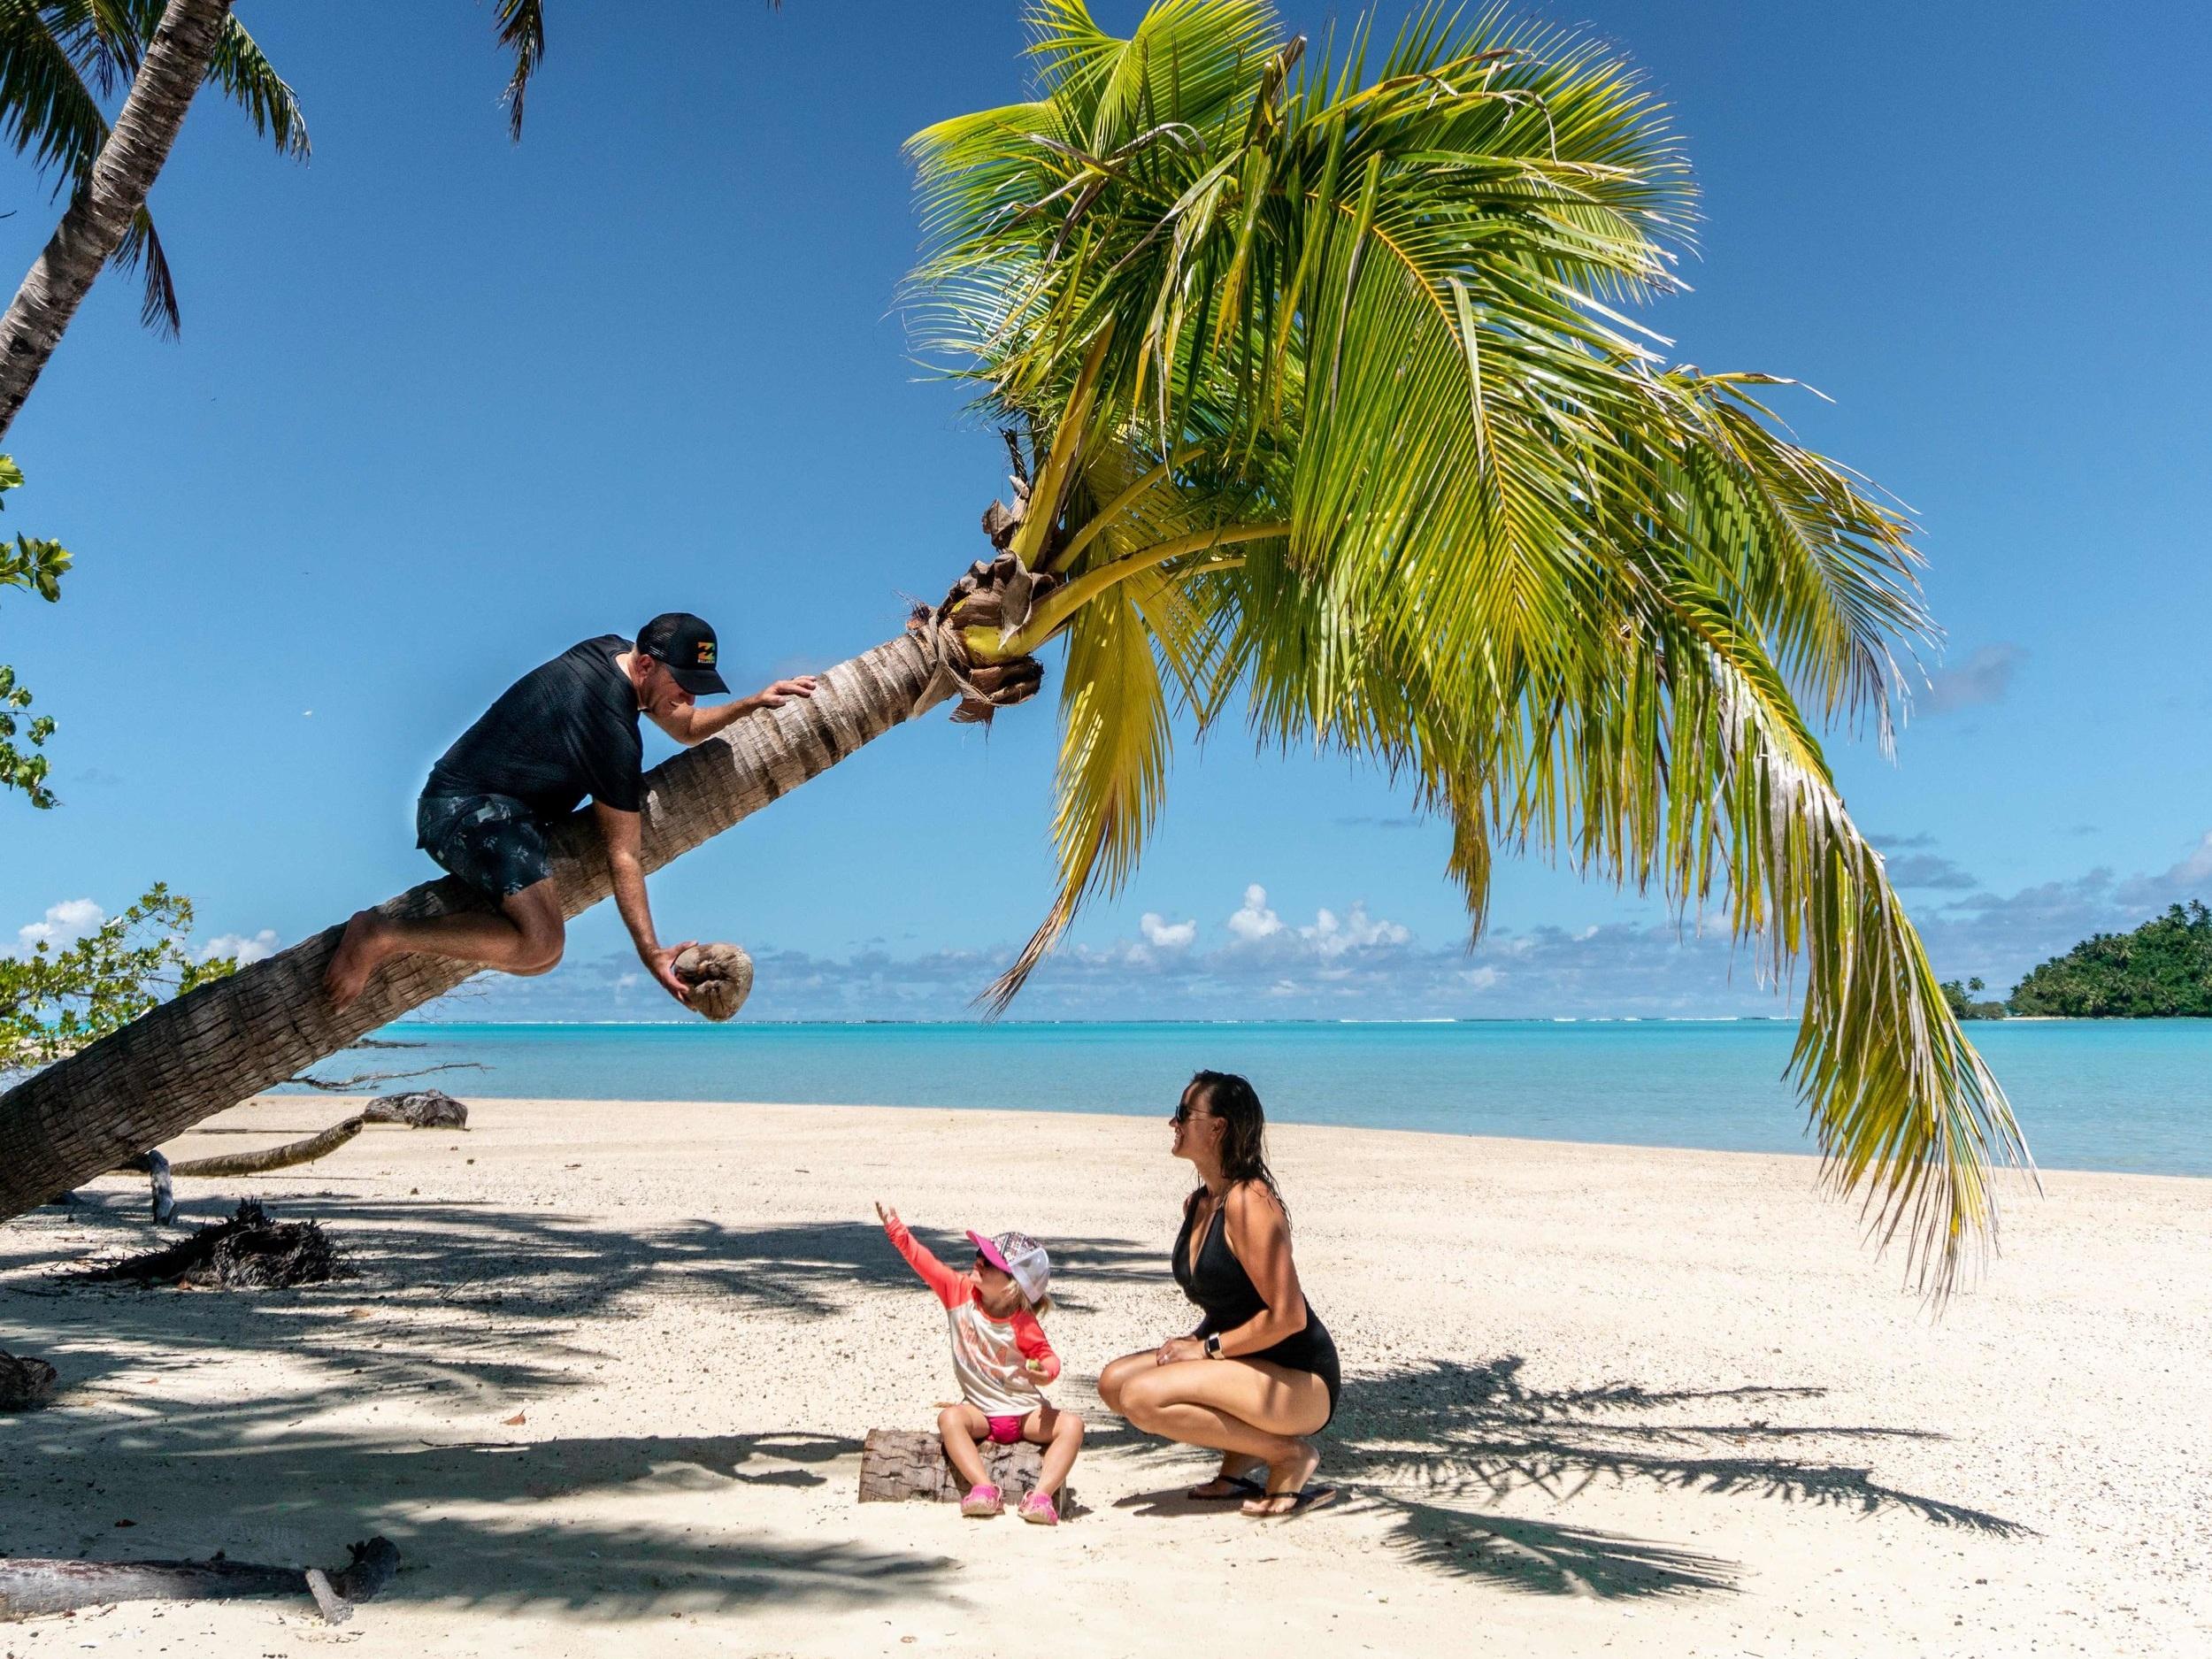 Island_Coconut_Palm+tree_Beach_Family_Paradise_Cook+Islands.jpg